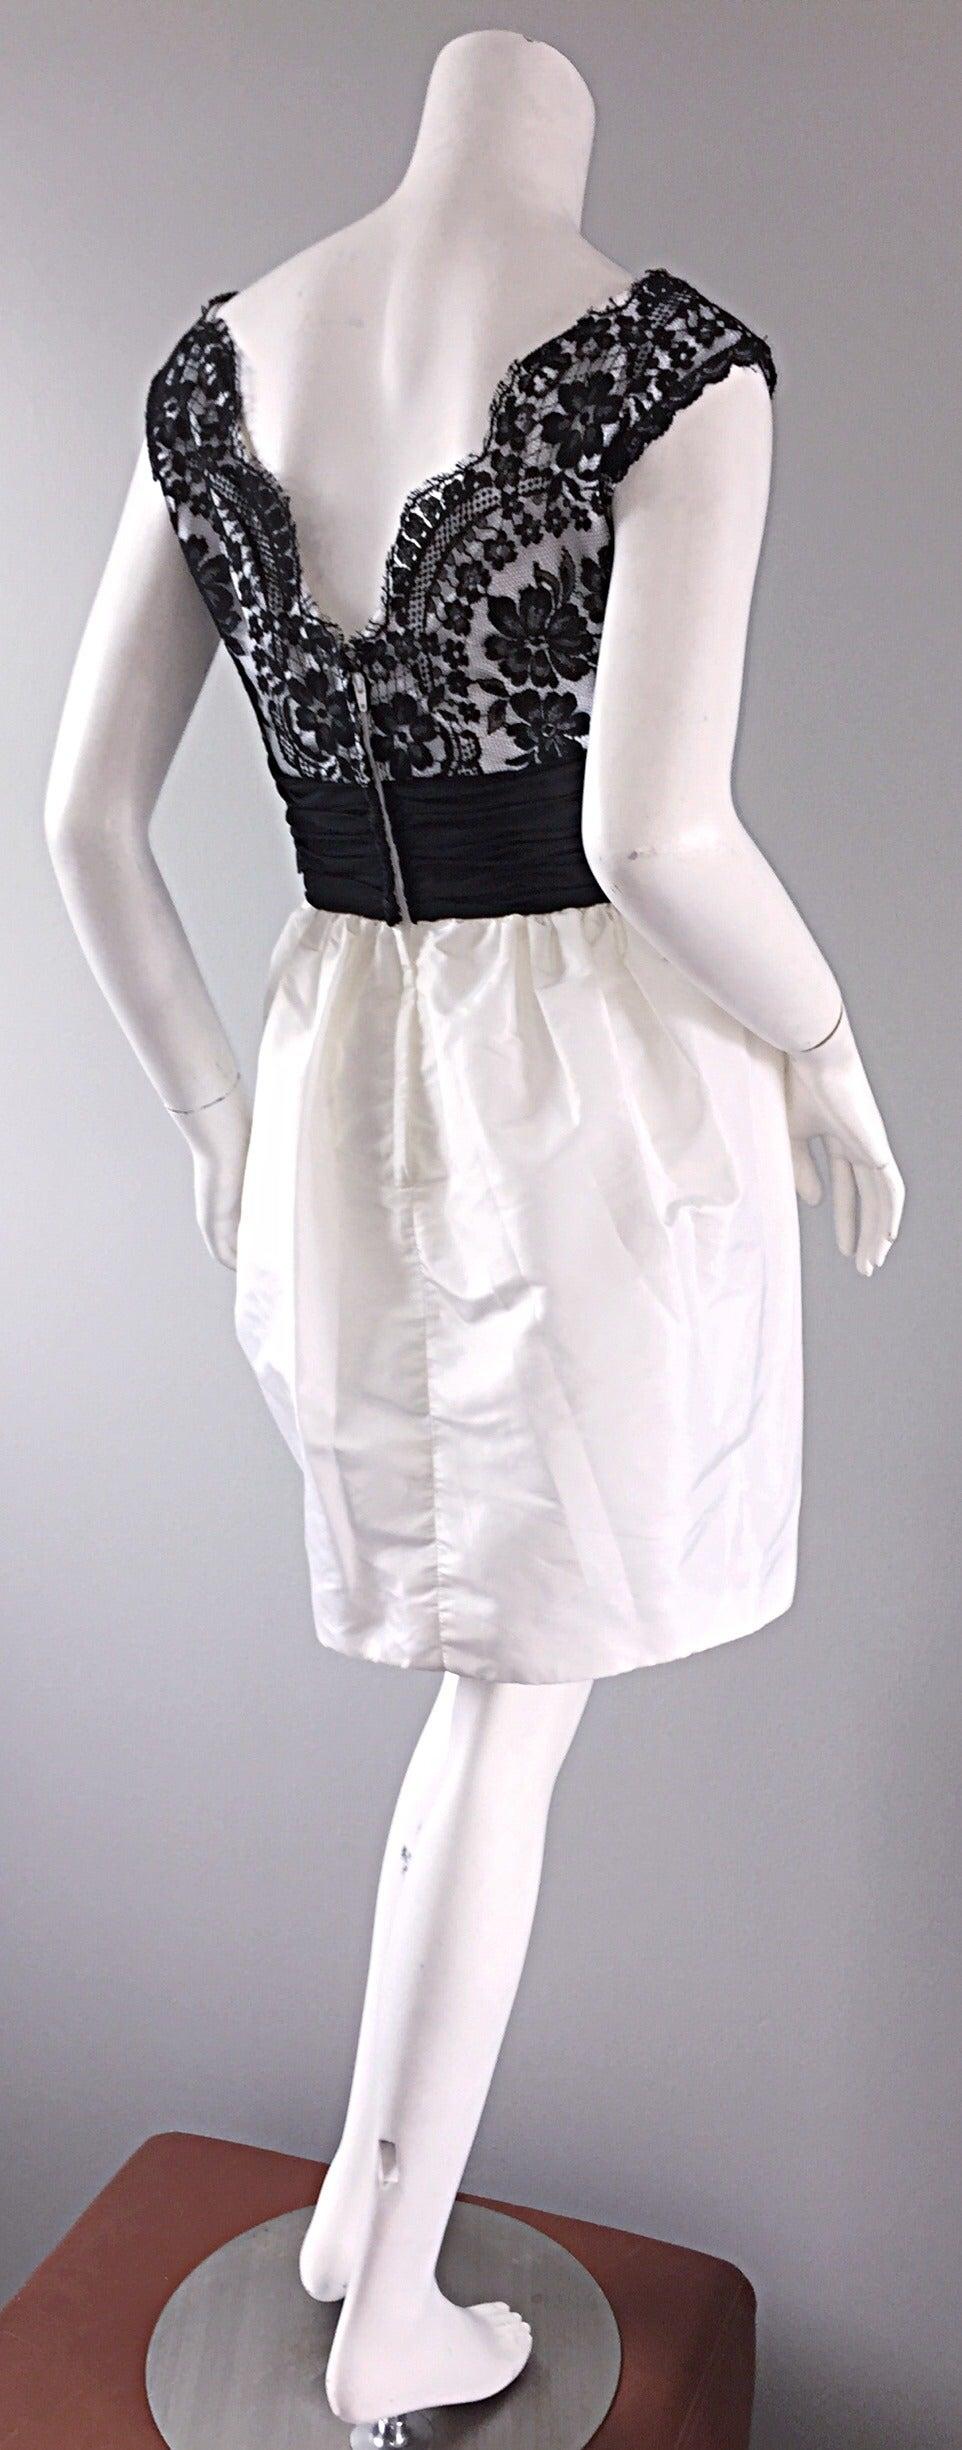 Vintage Victor Costa Black + White Silk Taffeta Lace Cocktail Dress 4